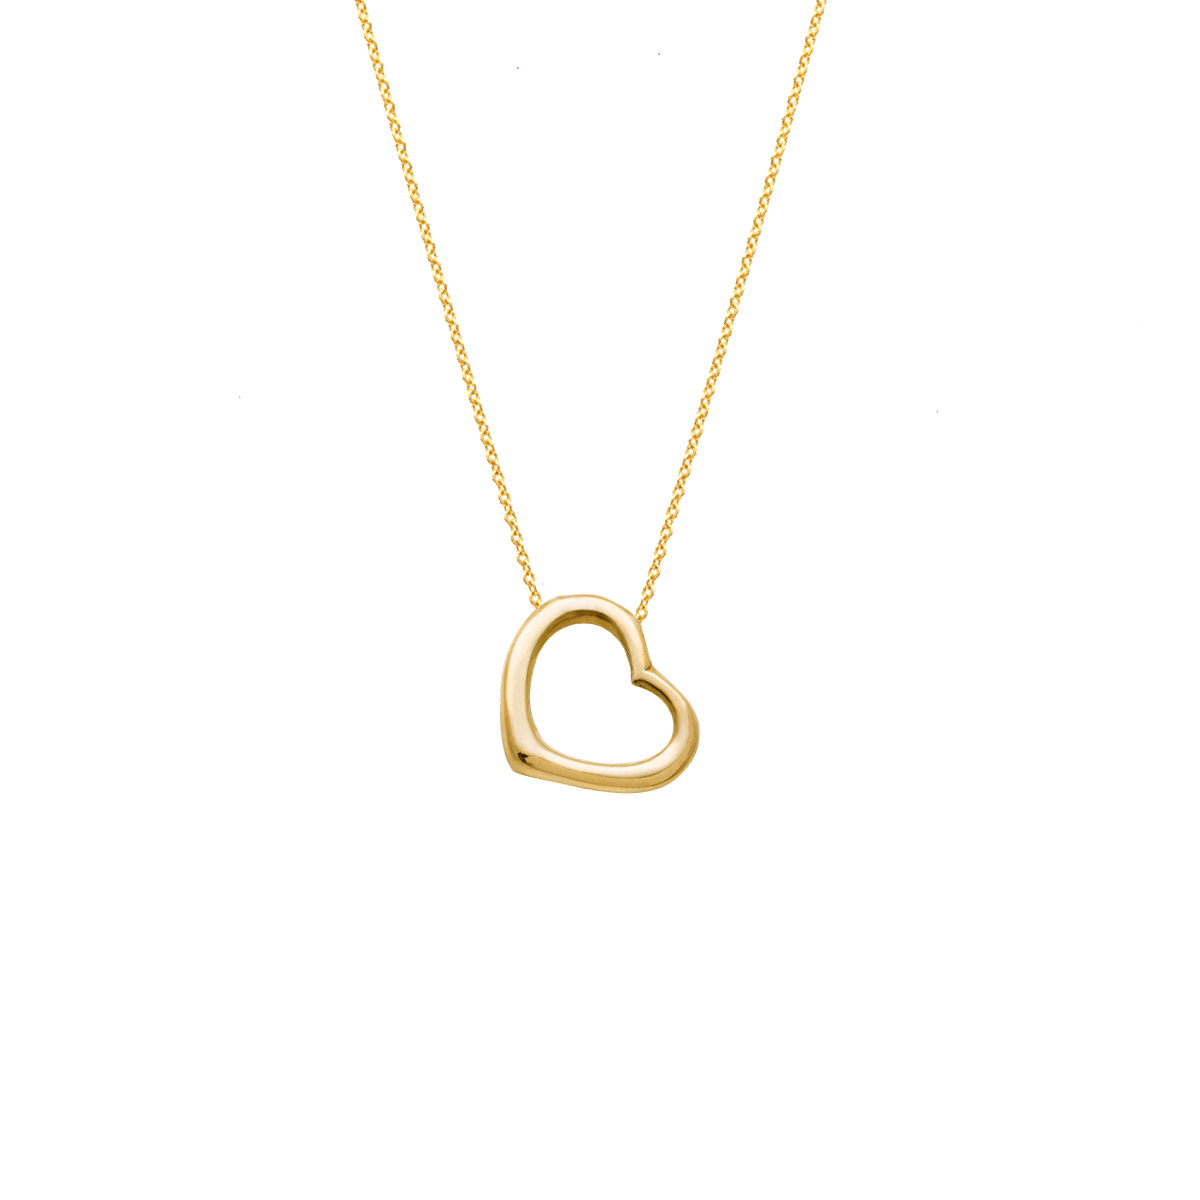 پرسته گردنبند طلا قلب بزرگ